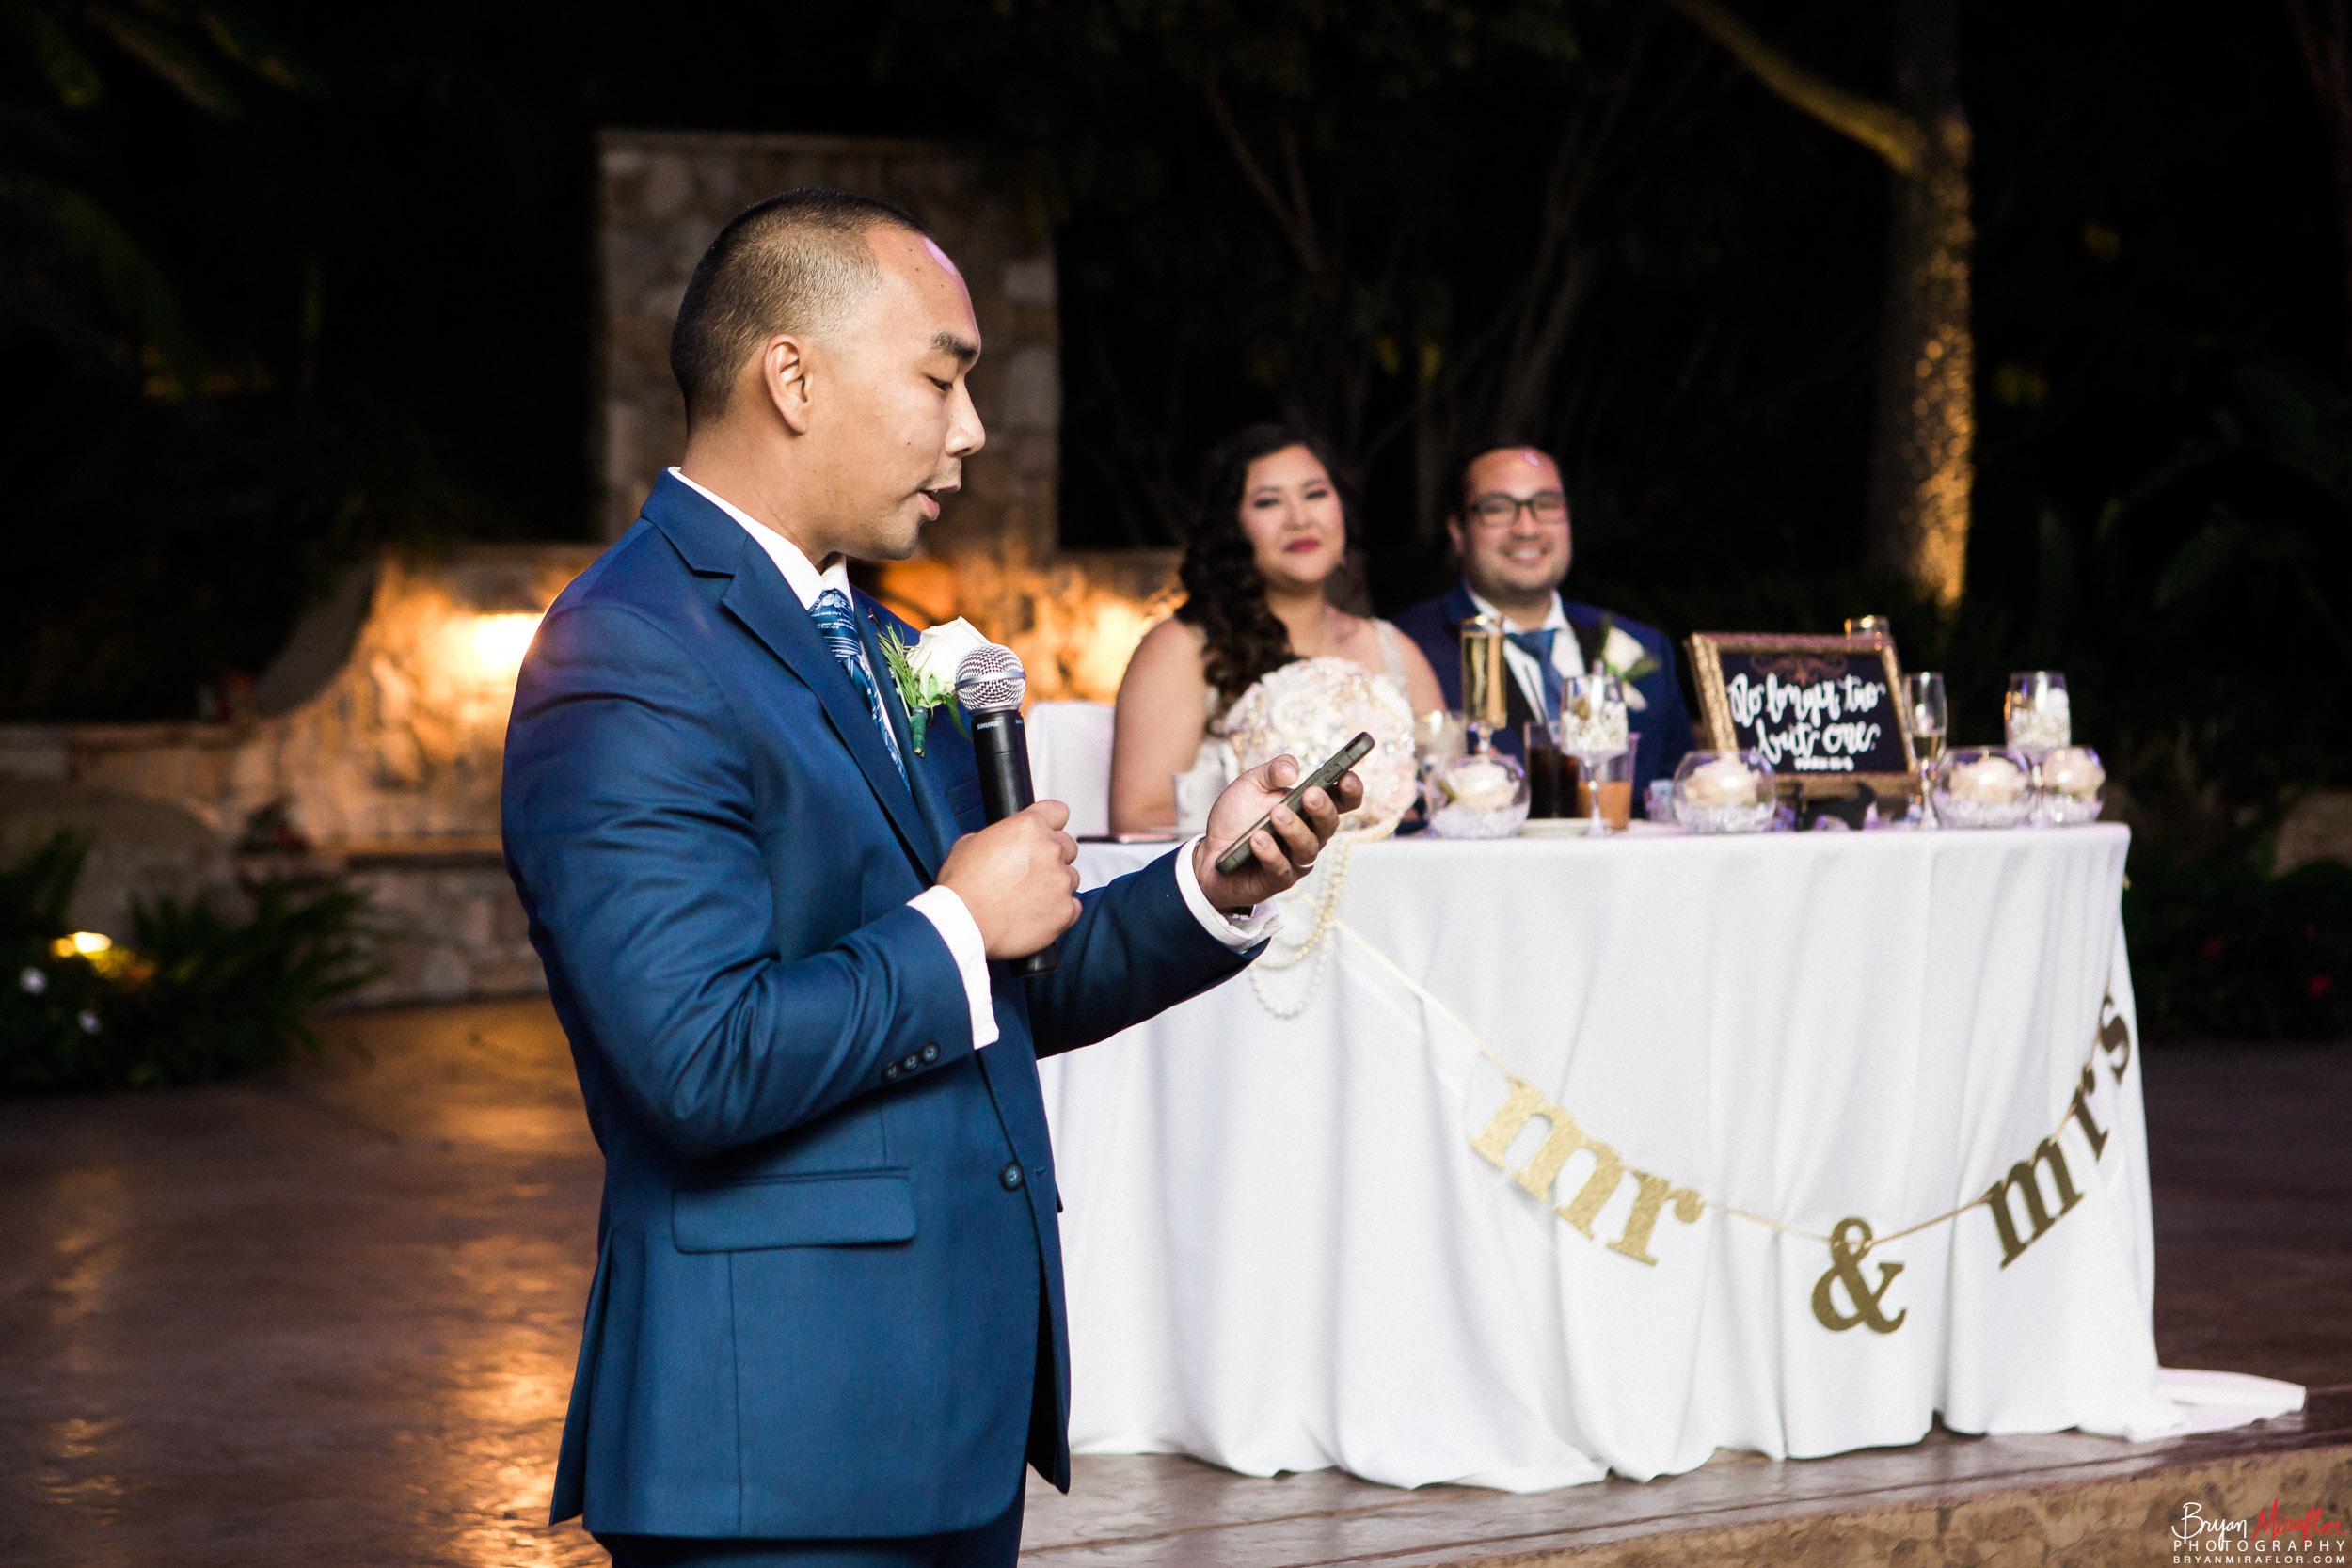 Bryan-Miraflor-Photography-Hannah-Jonathan-Married-Grand-Traditions-Estate-Gardens-Fallbrook-20171222-193.jpg